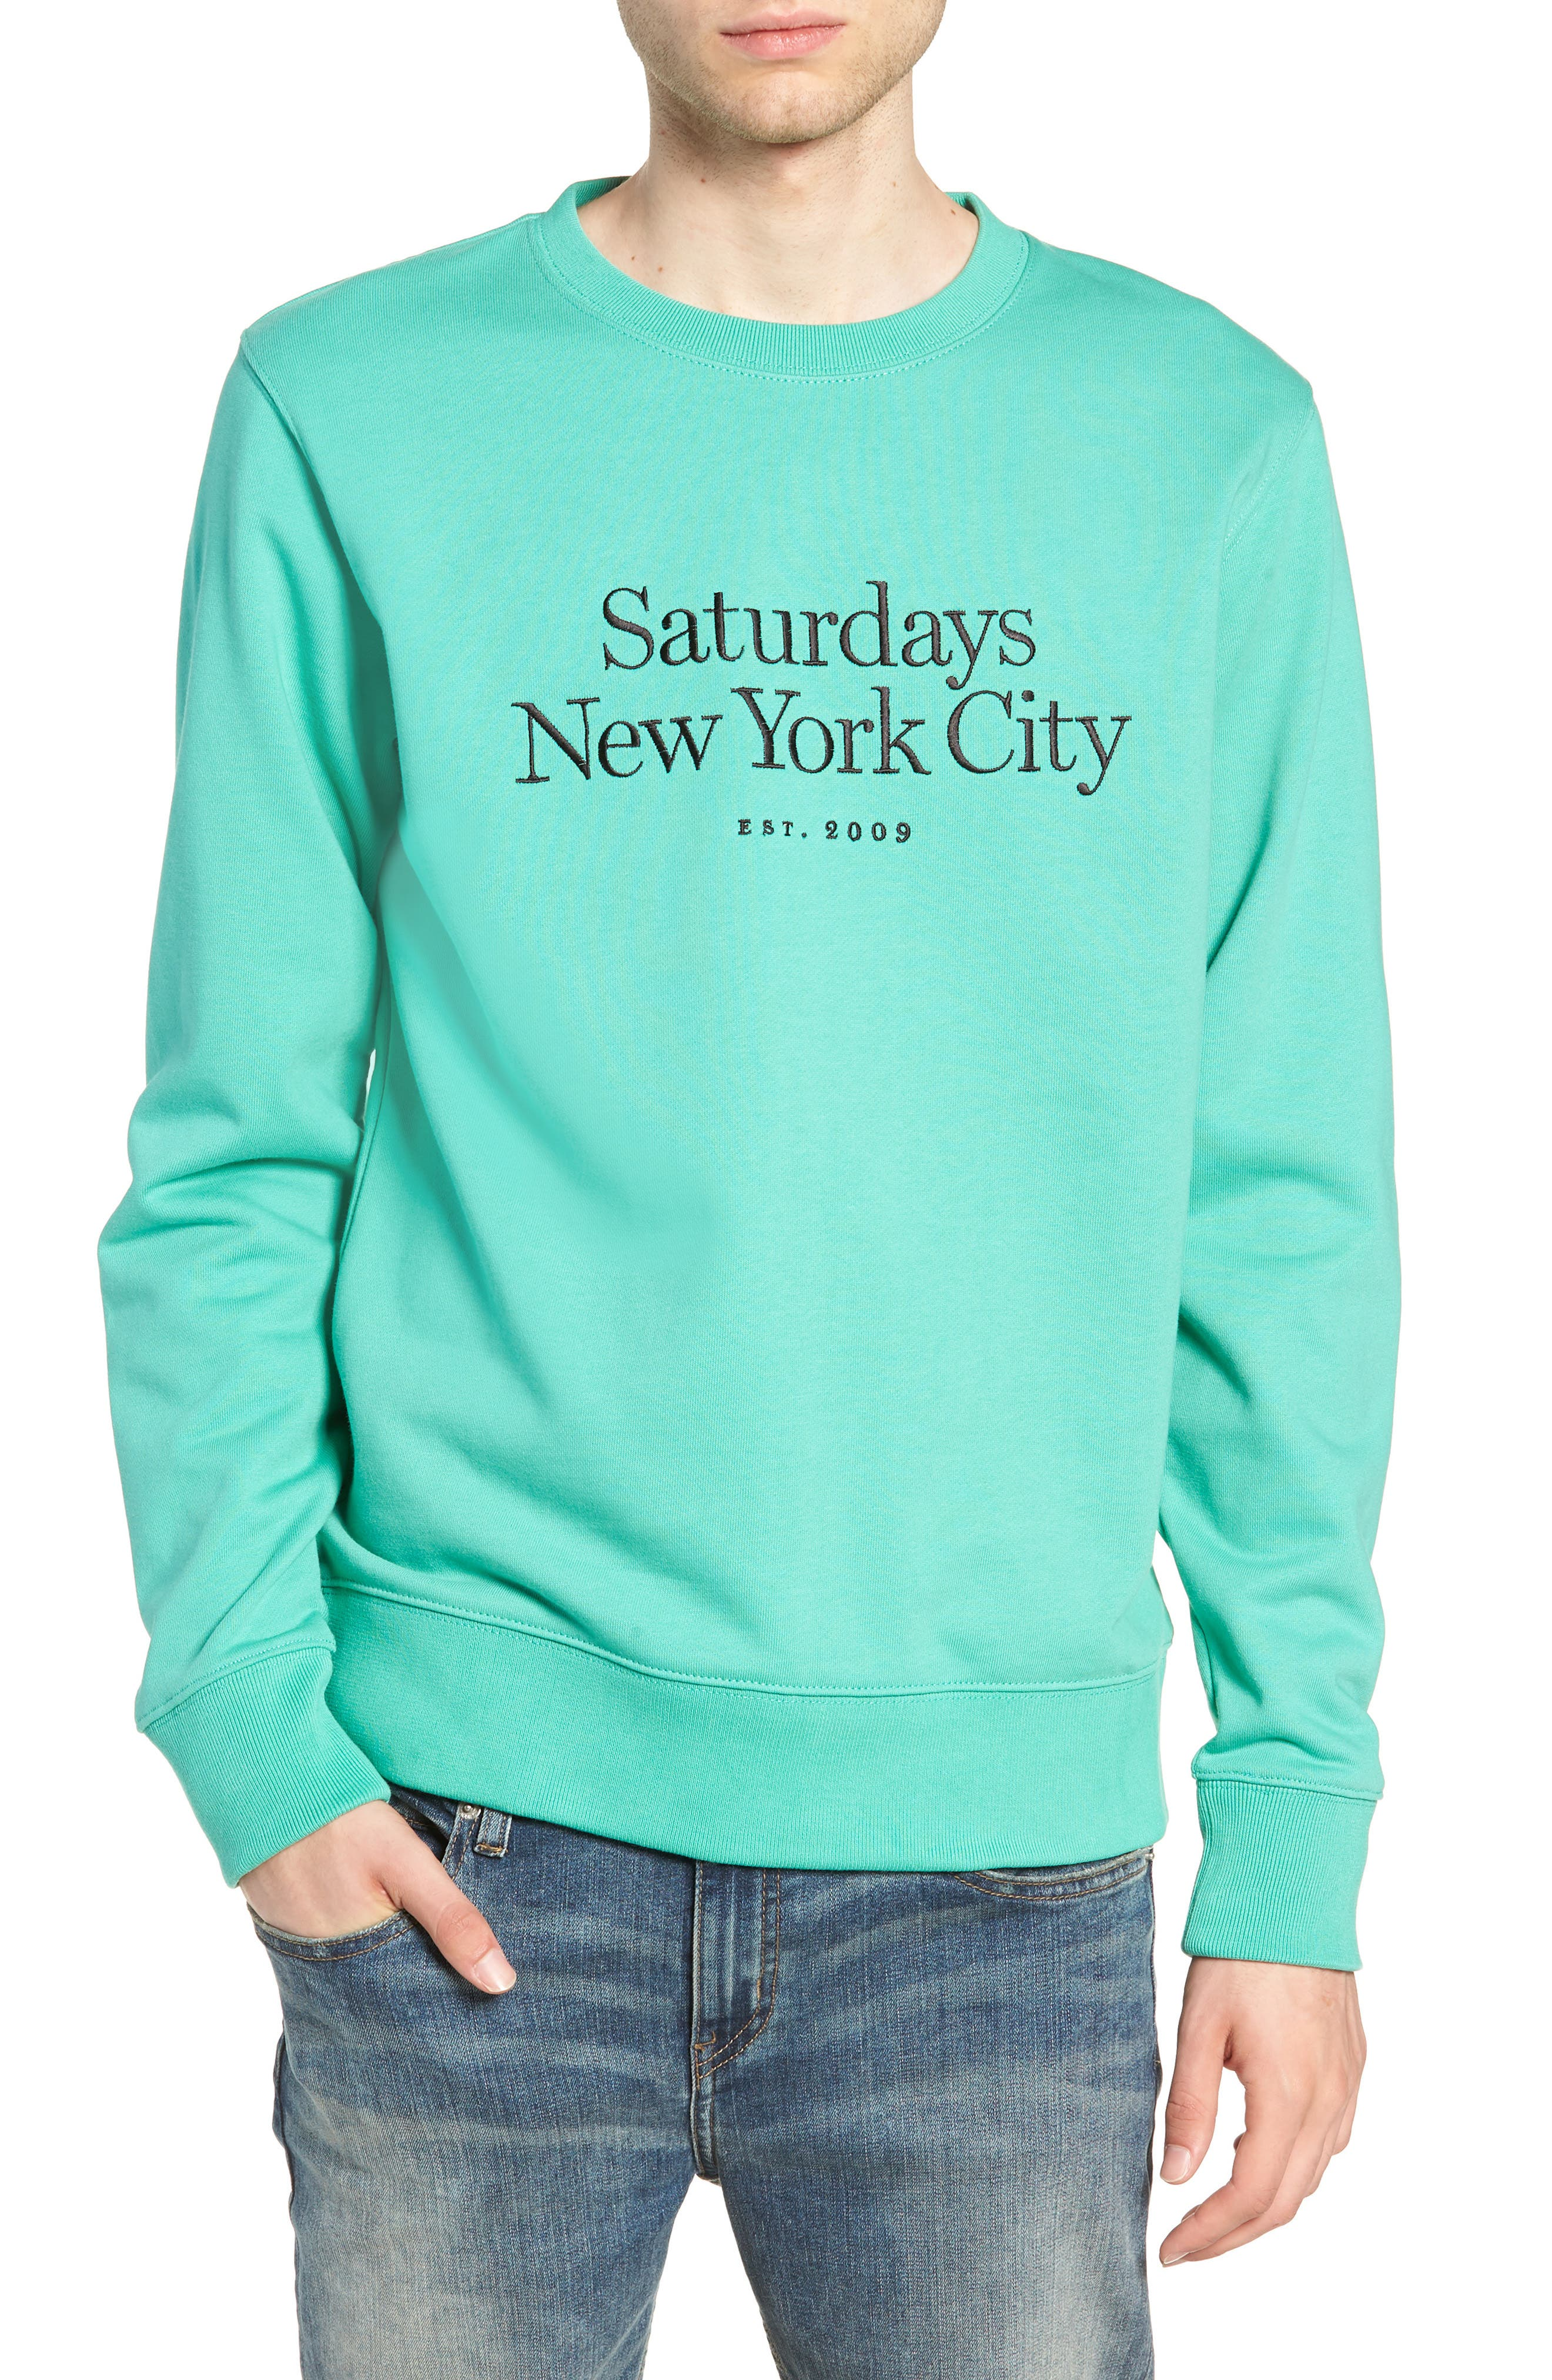 Bowery Embroidered Fleece Sweatshirt,                             Main thumbnail 1, color,                             SEAFOAM GREEN